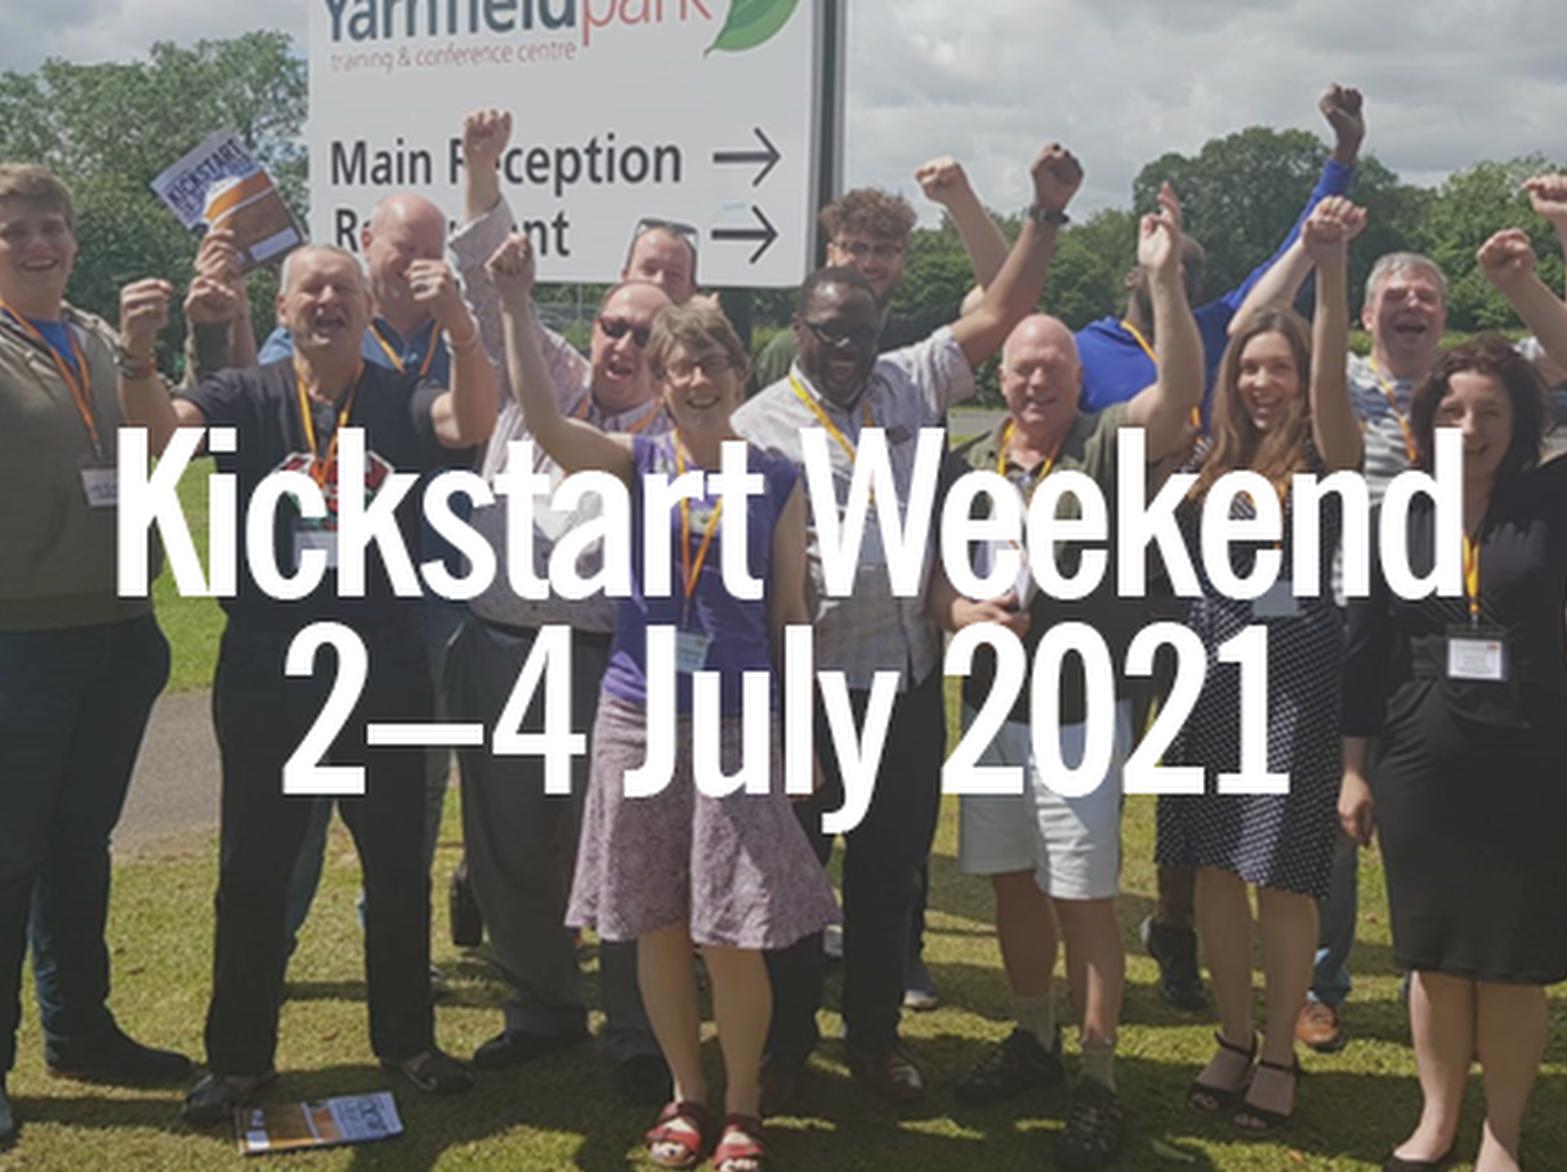 Kickstart Weekend, 2-4 July